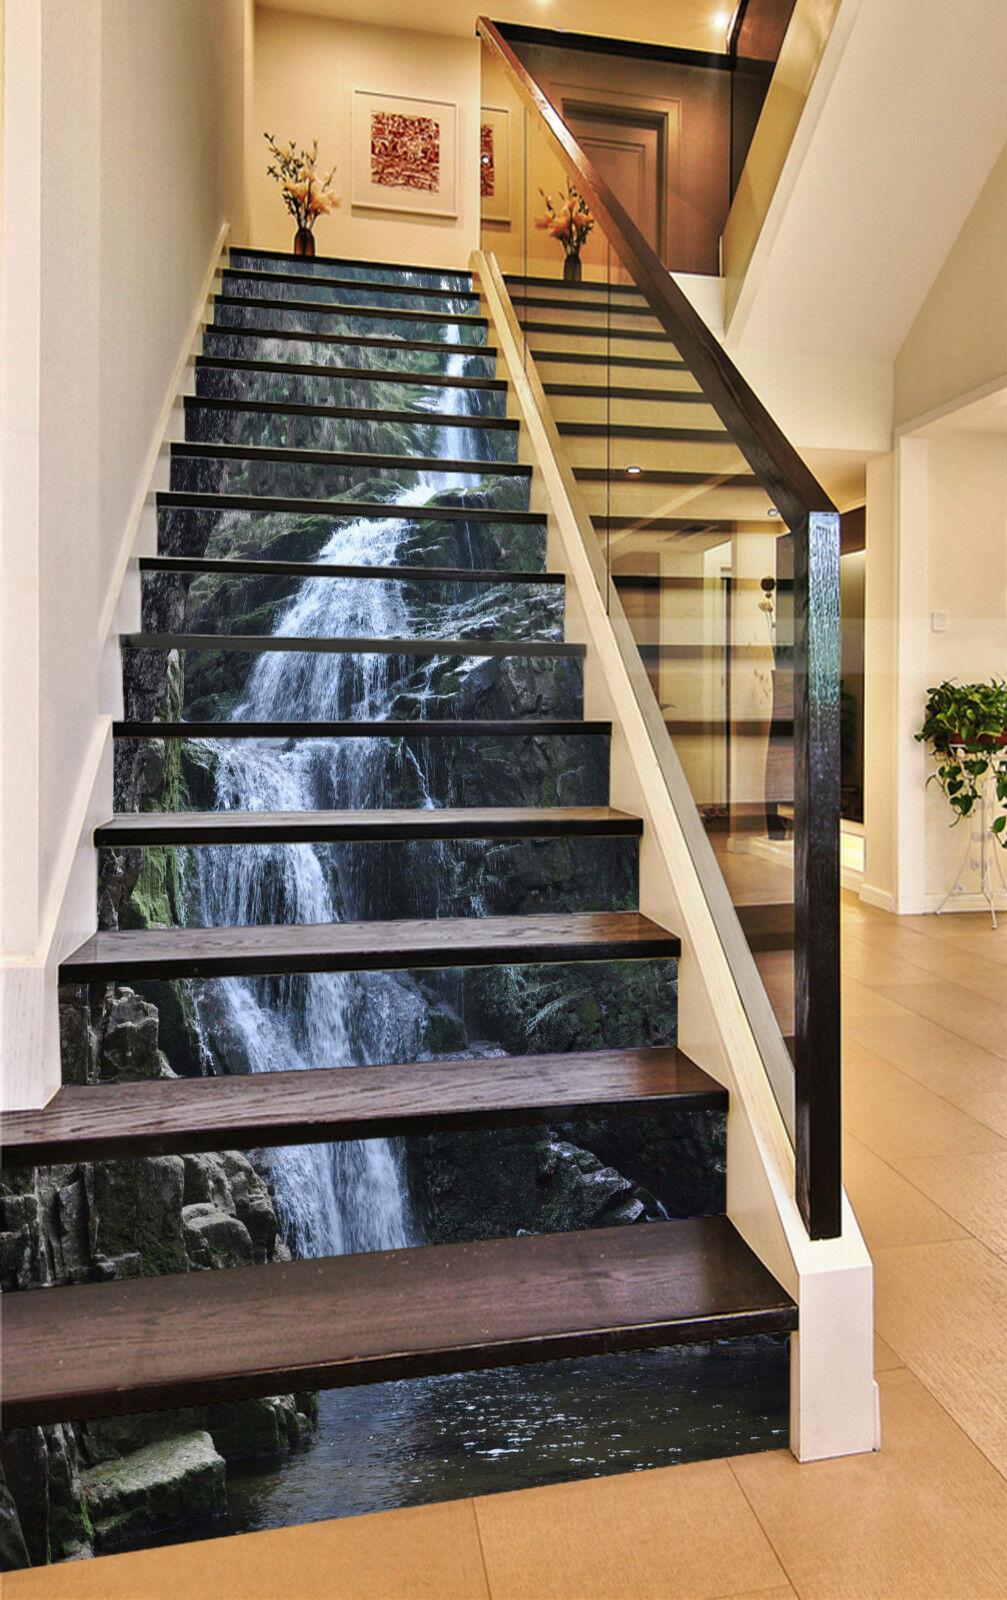 3D Wasserfall 335 Stair Risers Dekoration Fototapete Vinyl Aufkleber Tapete DE